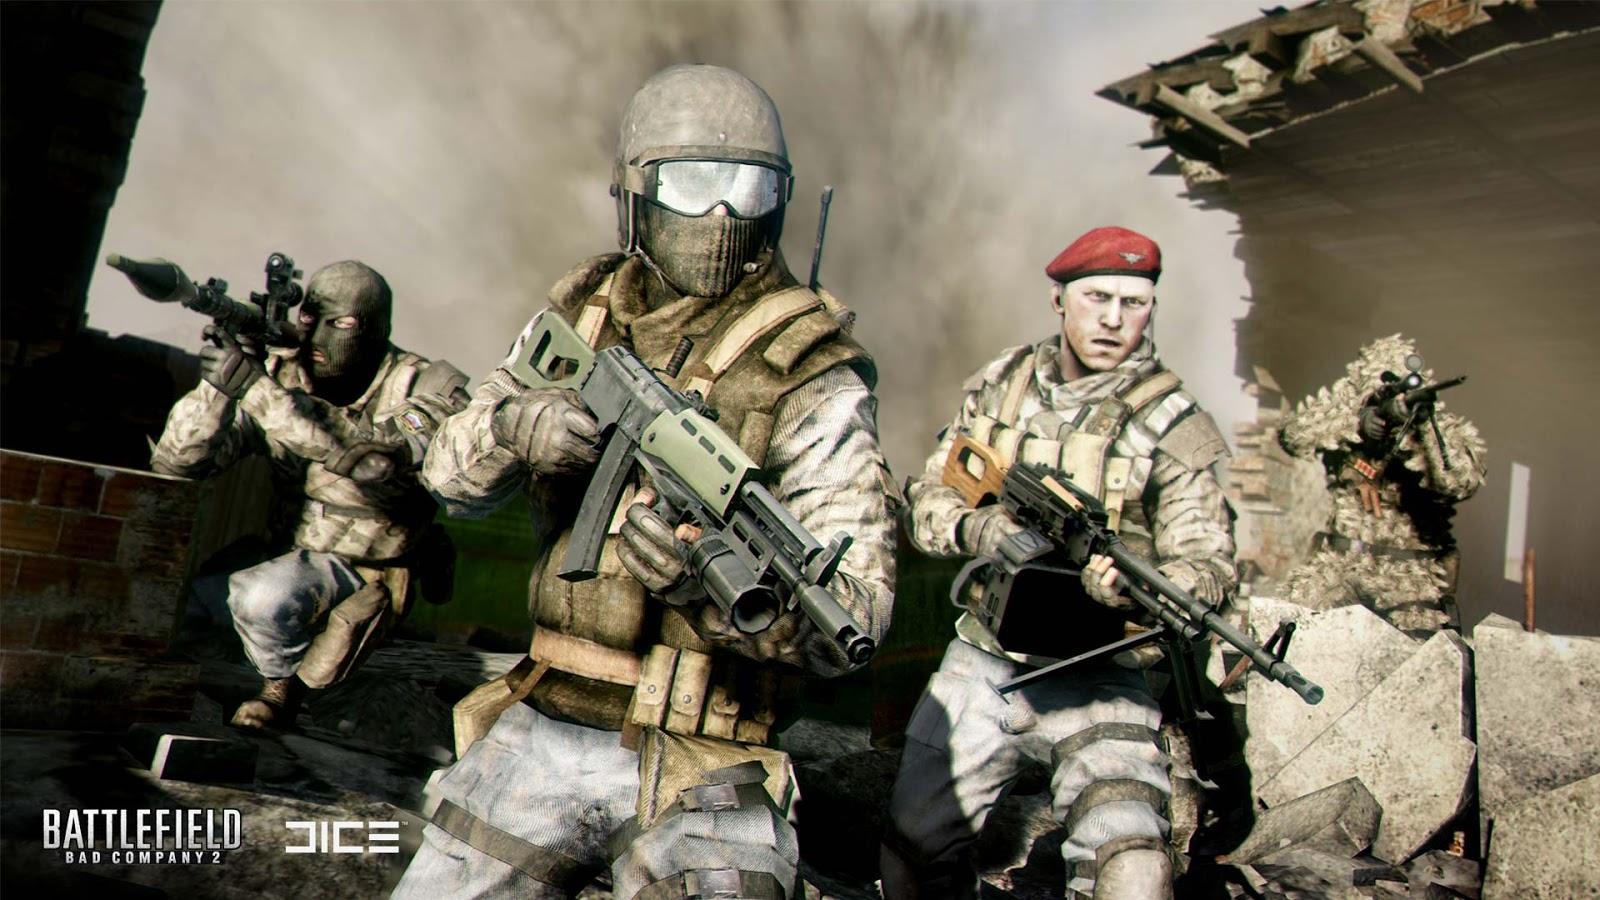 Battlefield bad company 2 vietnam server list overview | i